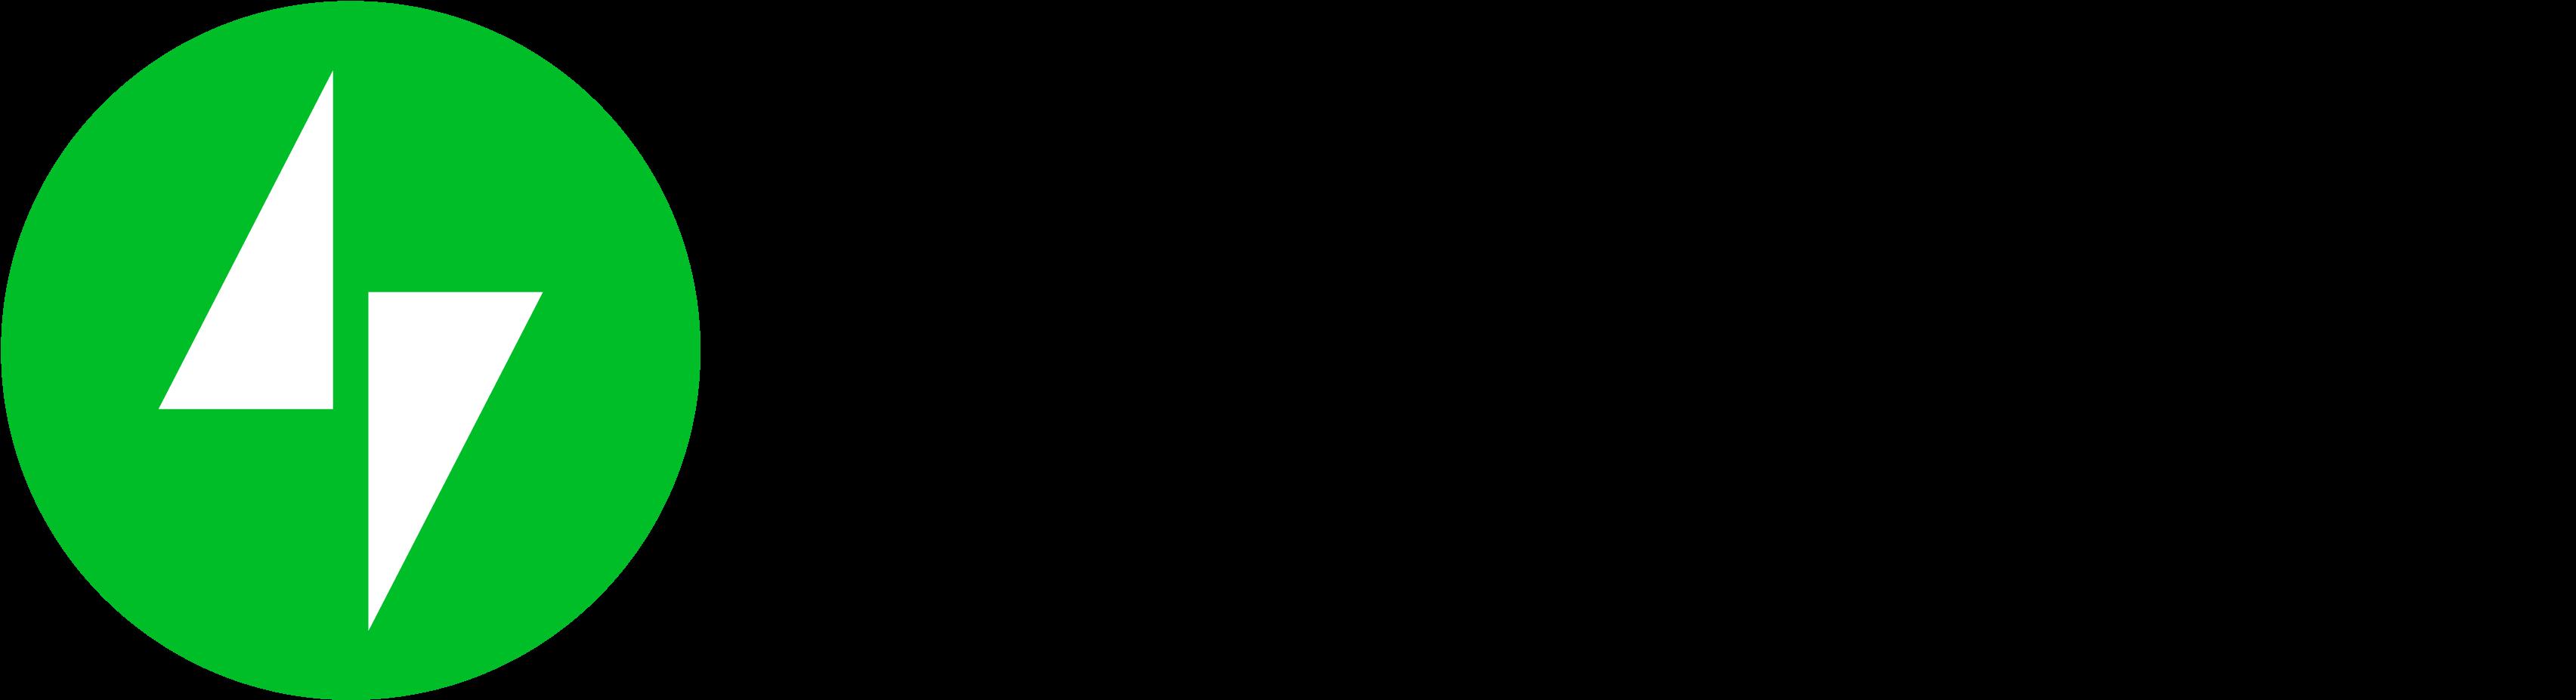 Download Hd Horizontal White Logo Cash App Logo Transparent Png Image Nicepng Com